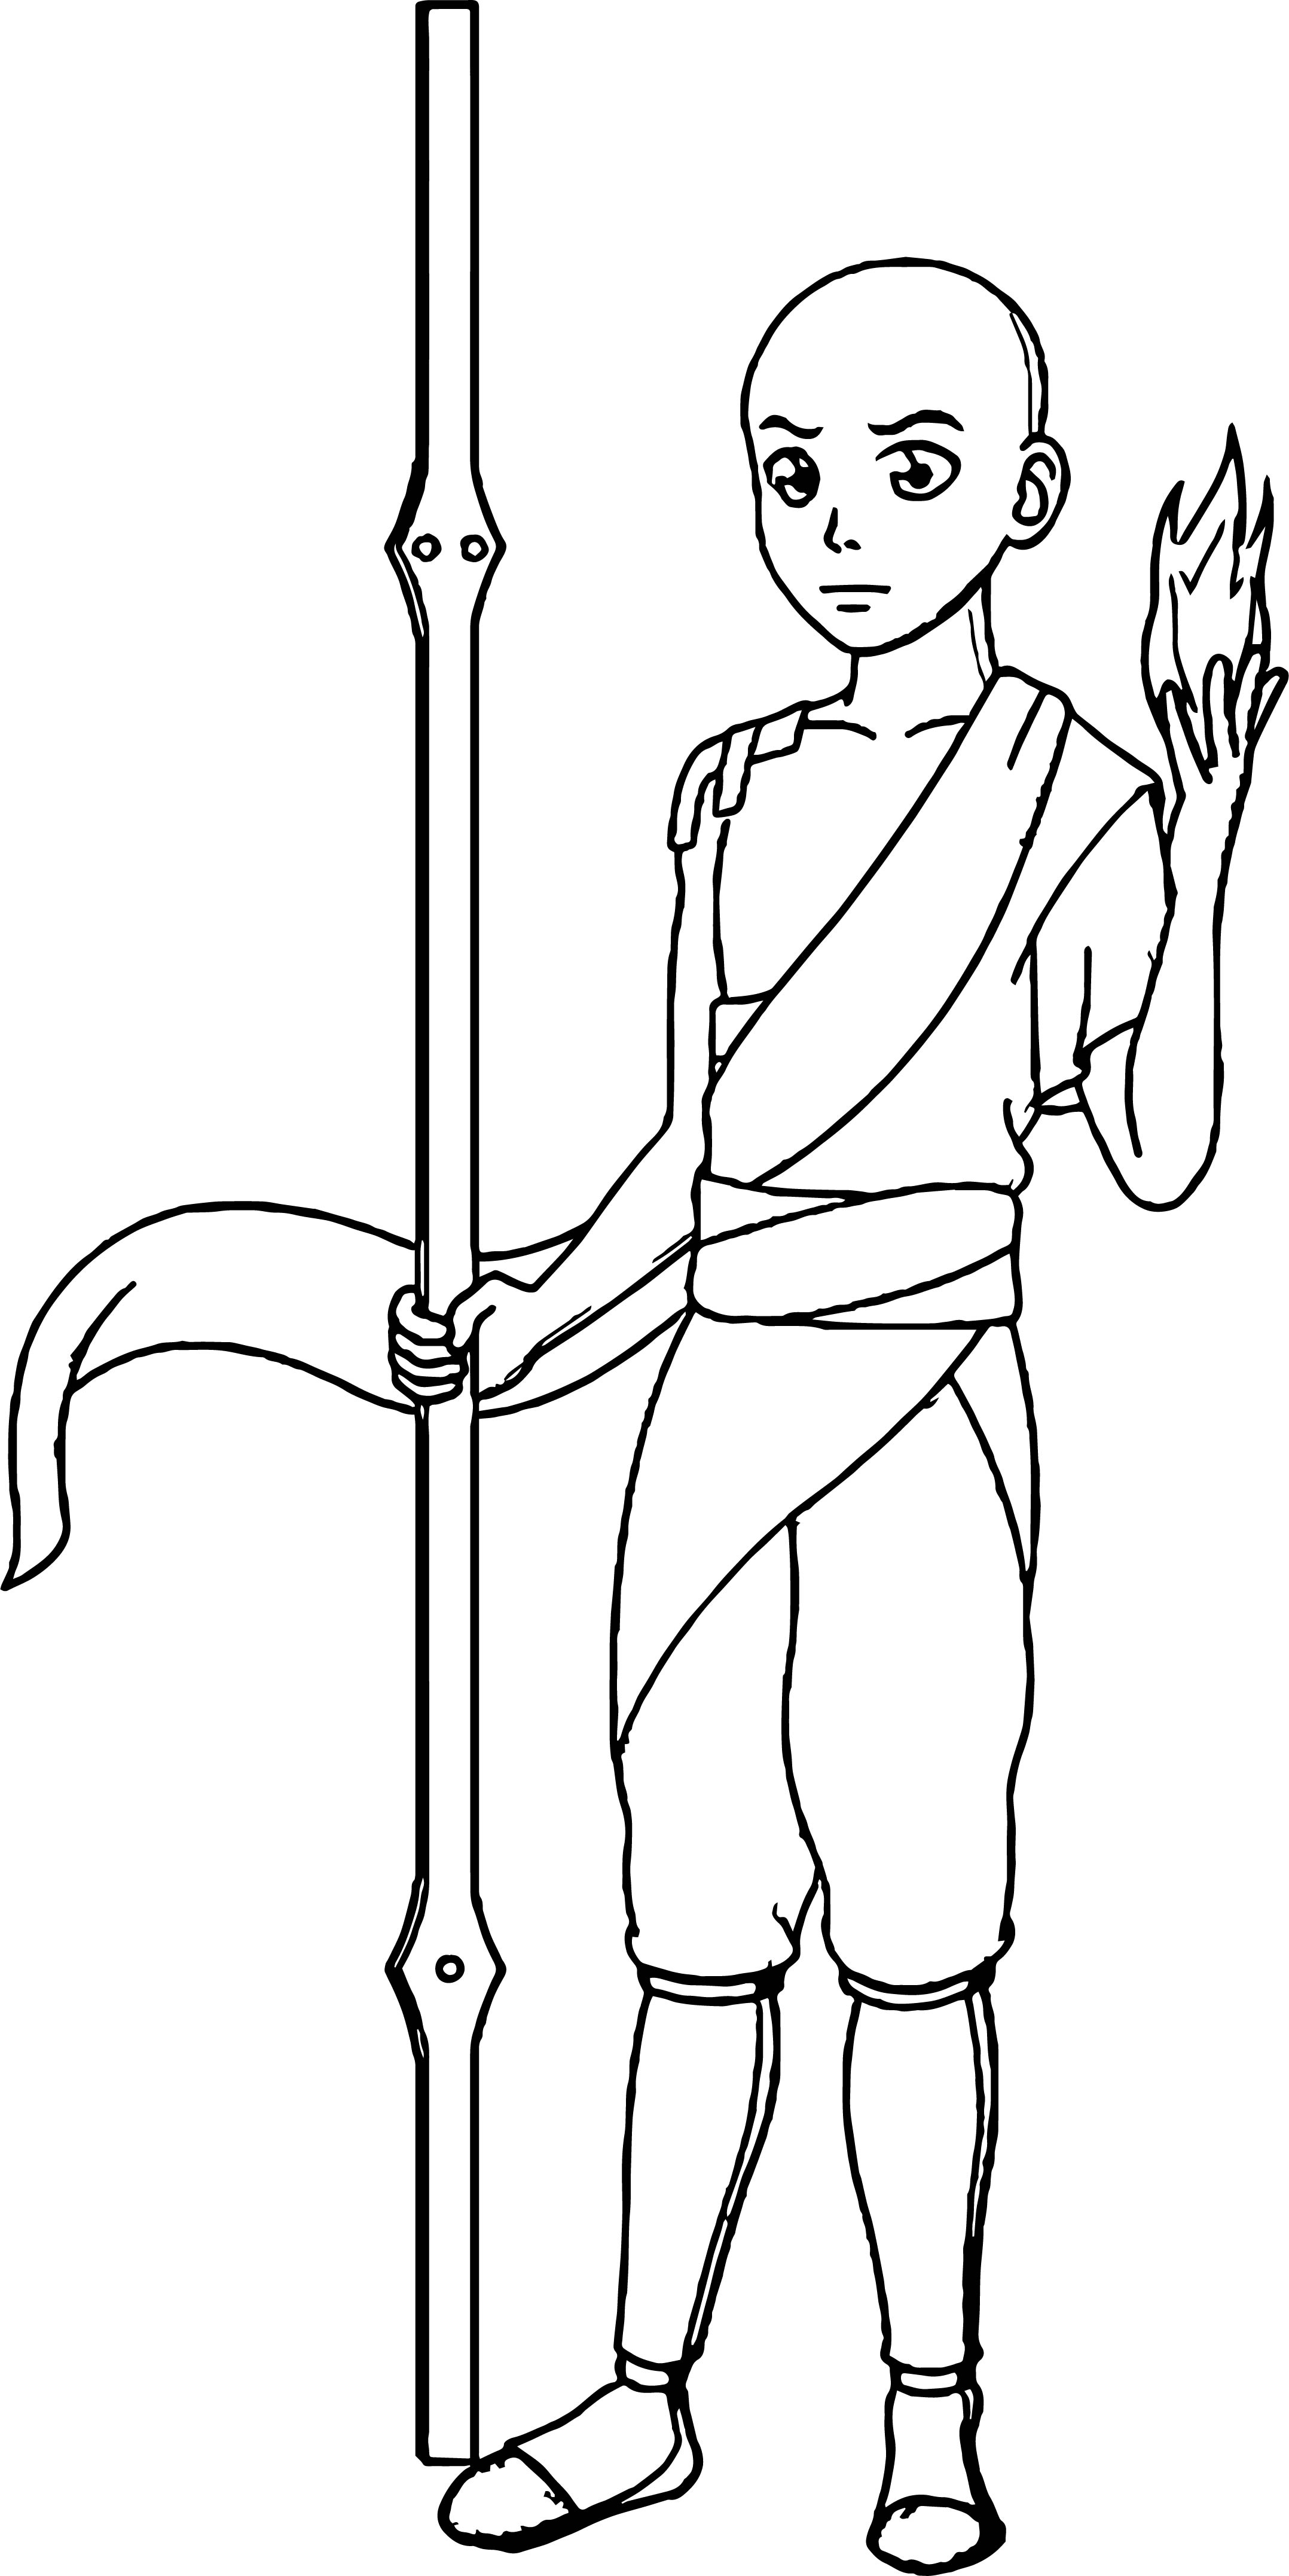 Avatar Aang Book Bonjourmonami Avatar Aang Coloring Page